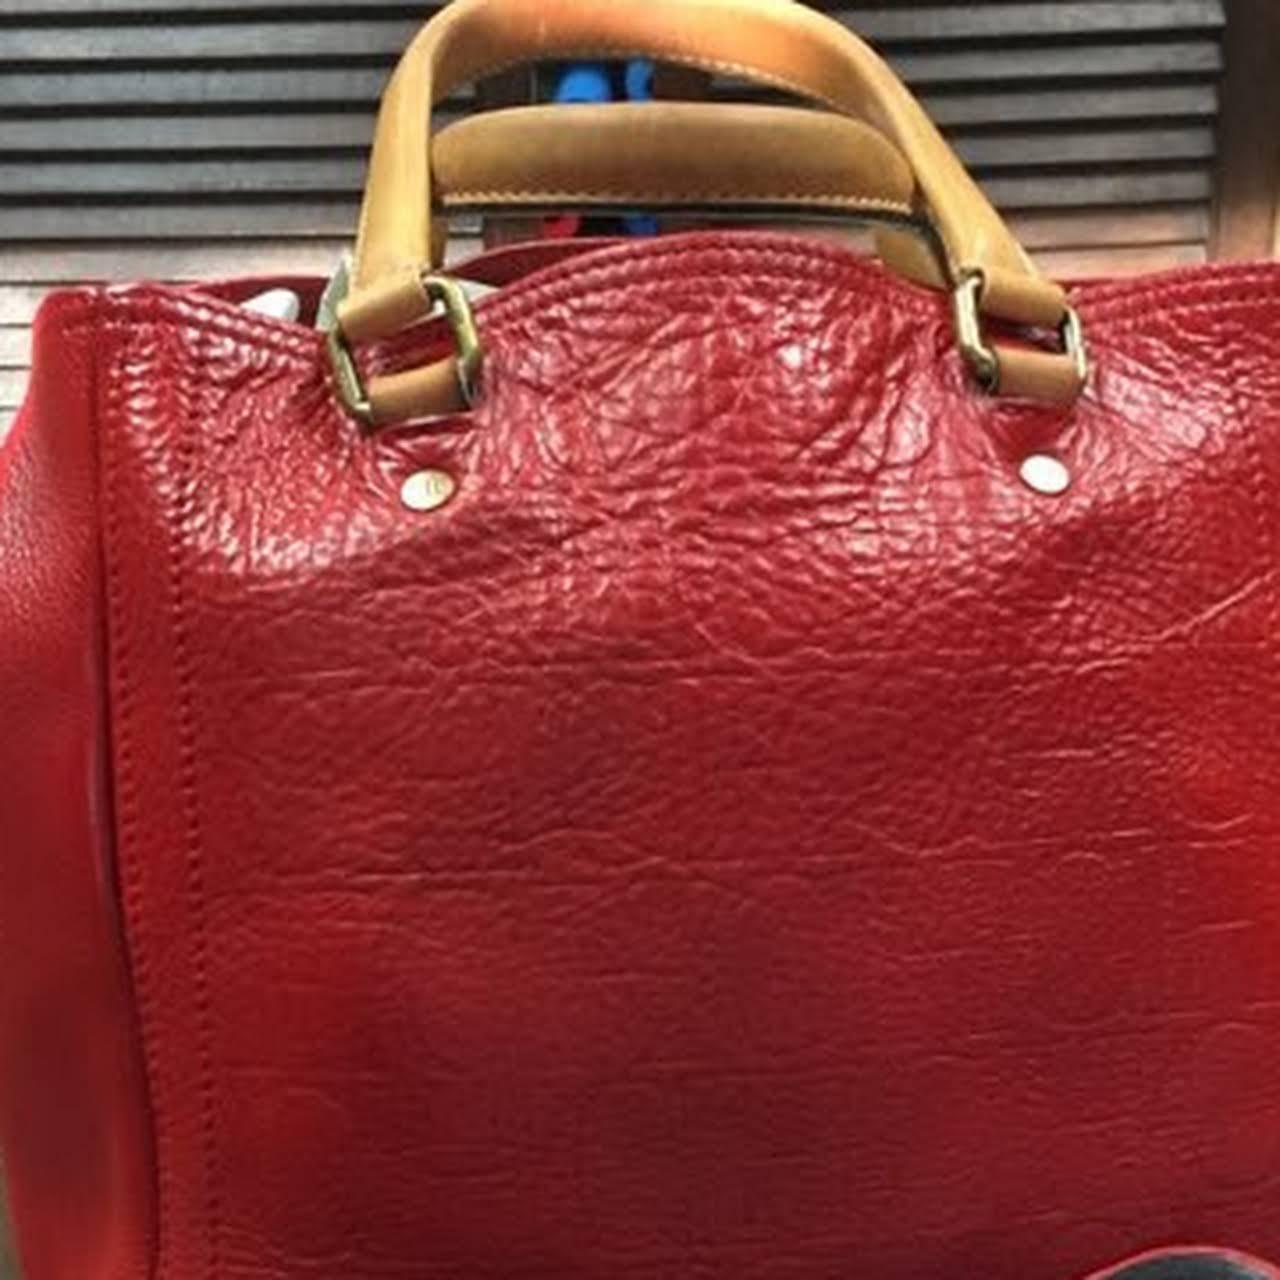 Harry's Bag & Shoe Repair - Located in Downtown Rialto  Shoe